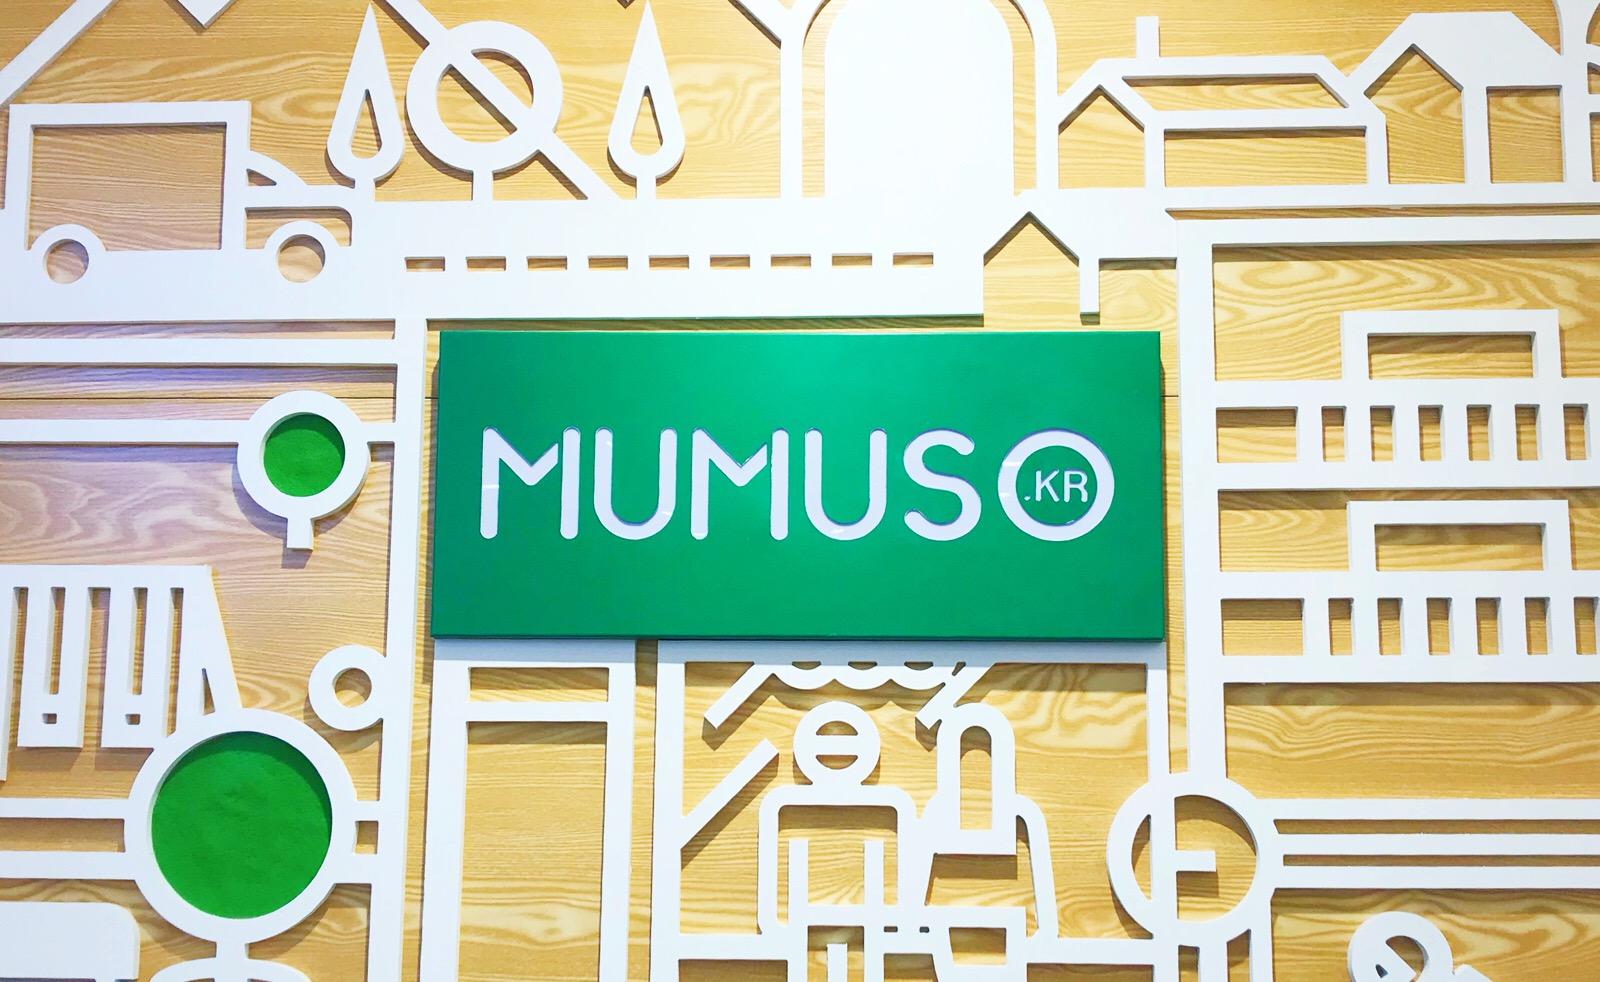 mumuso_tienda_lima_peru